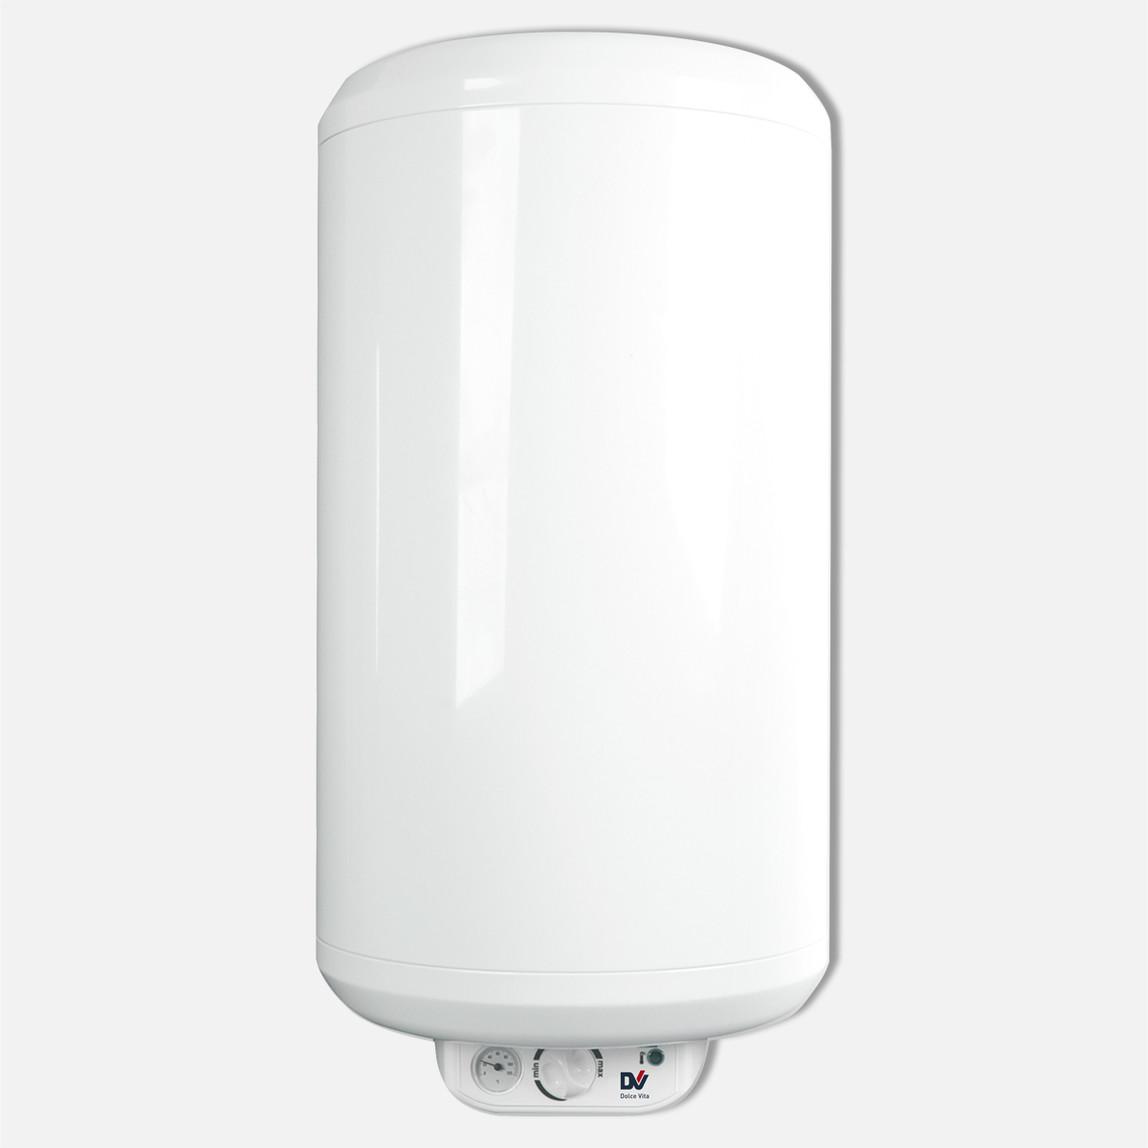 Dolce Vita Aqua Konfor 65 Litre Termosifon